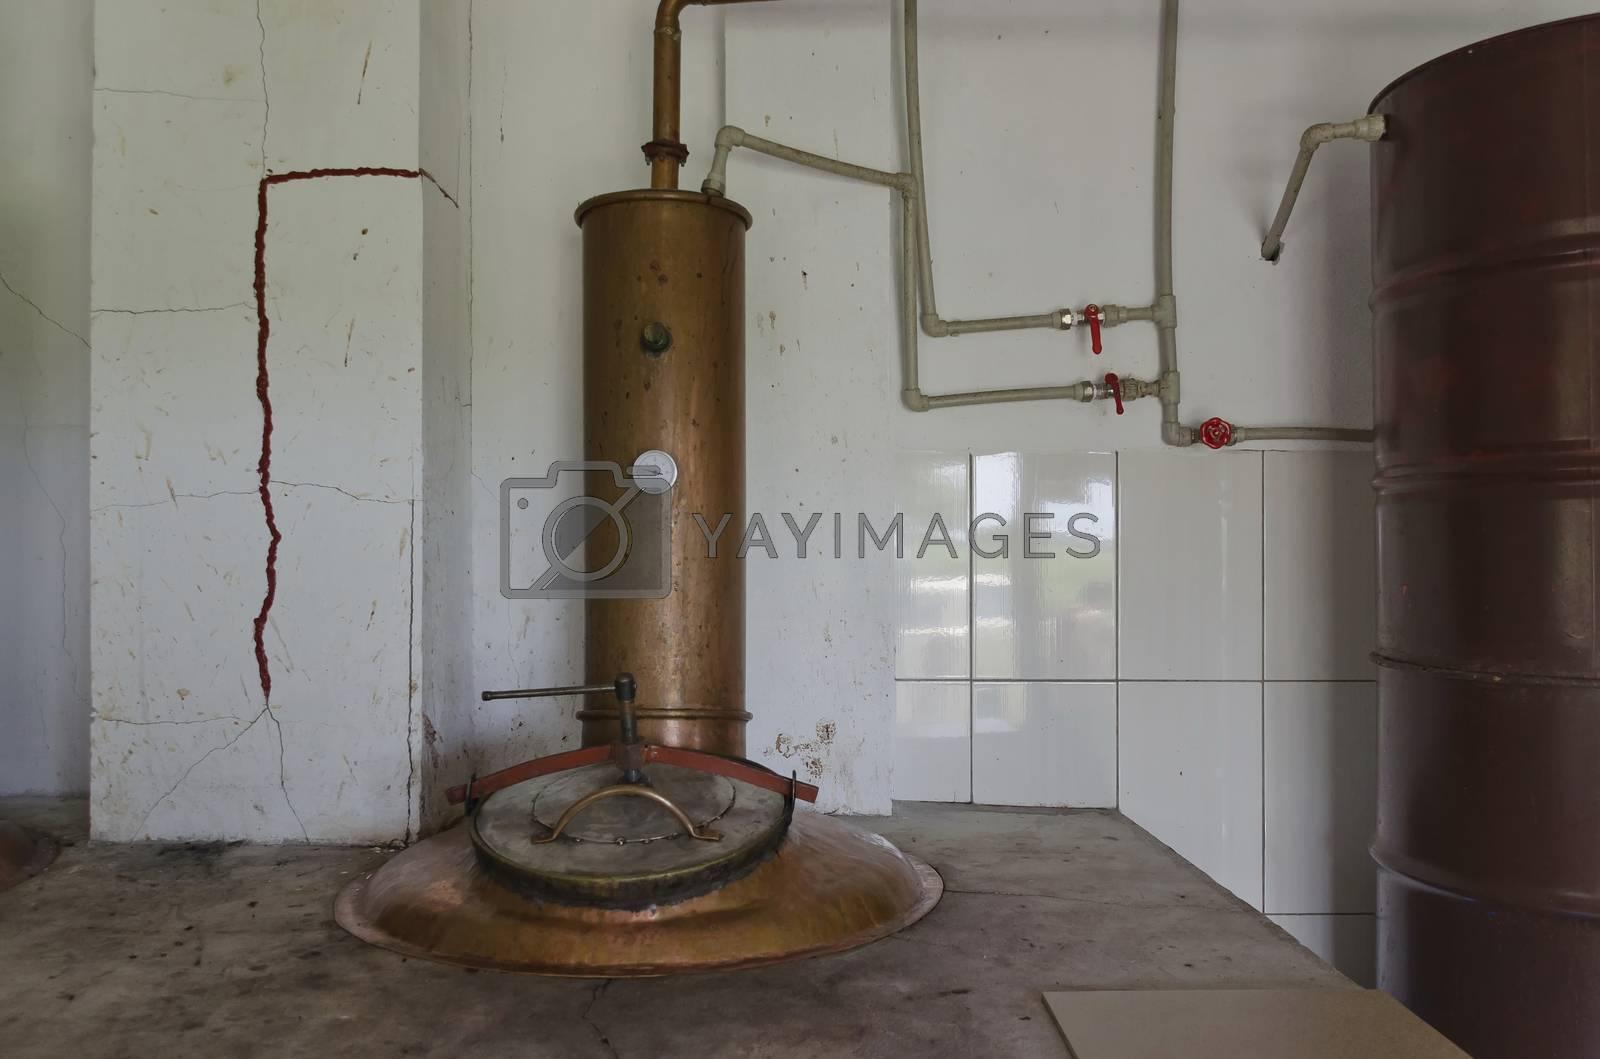 Fragment of copper boiler in distillery for vapor and distill grapes brandy, Bulgaria